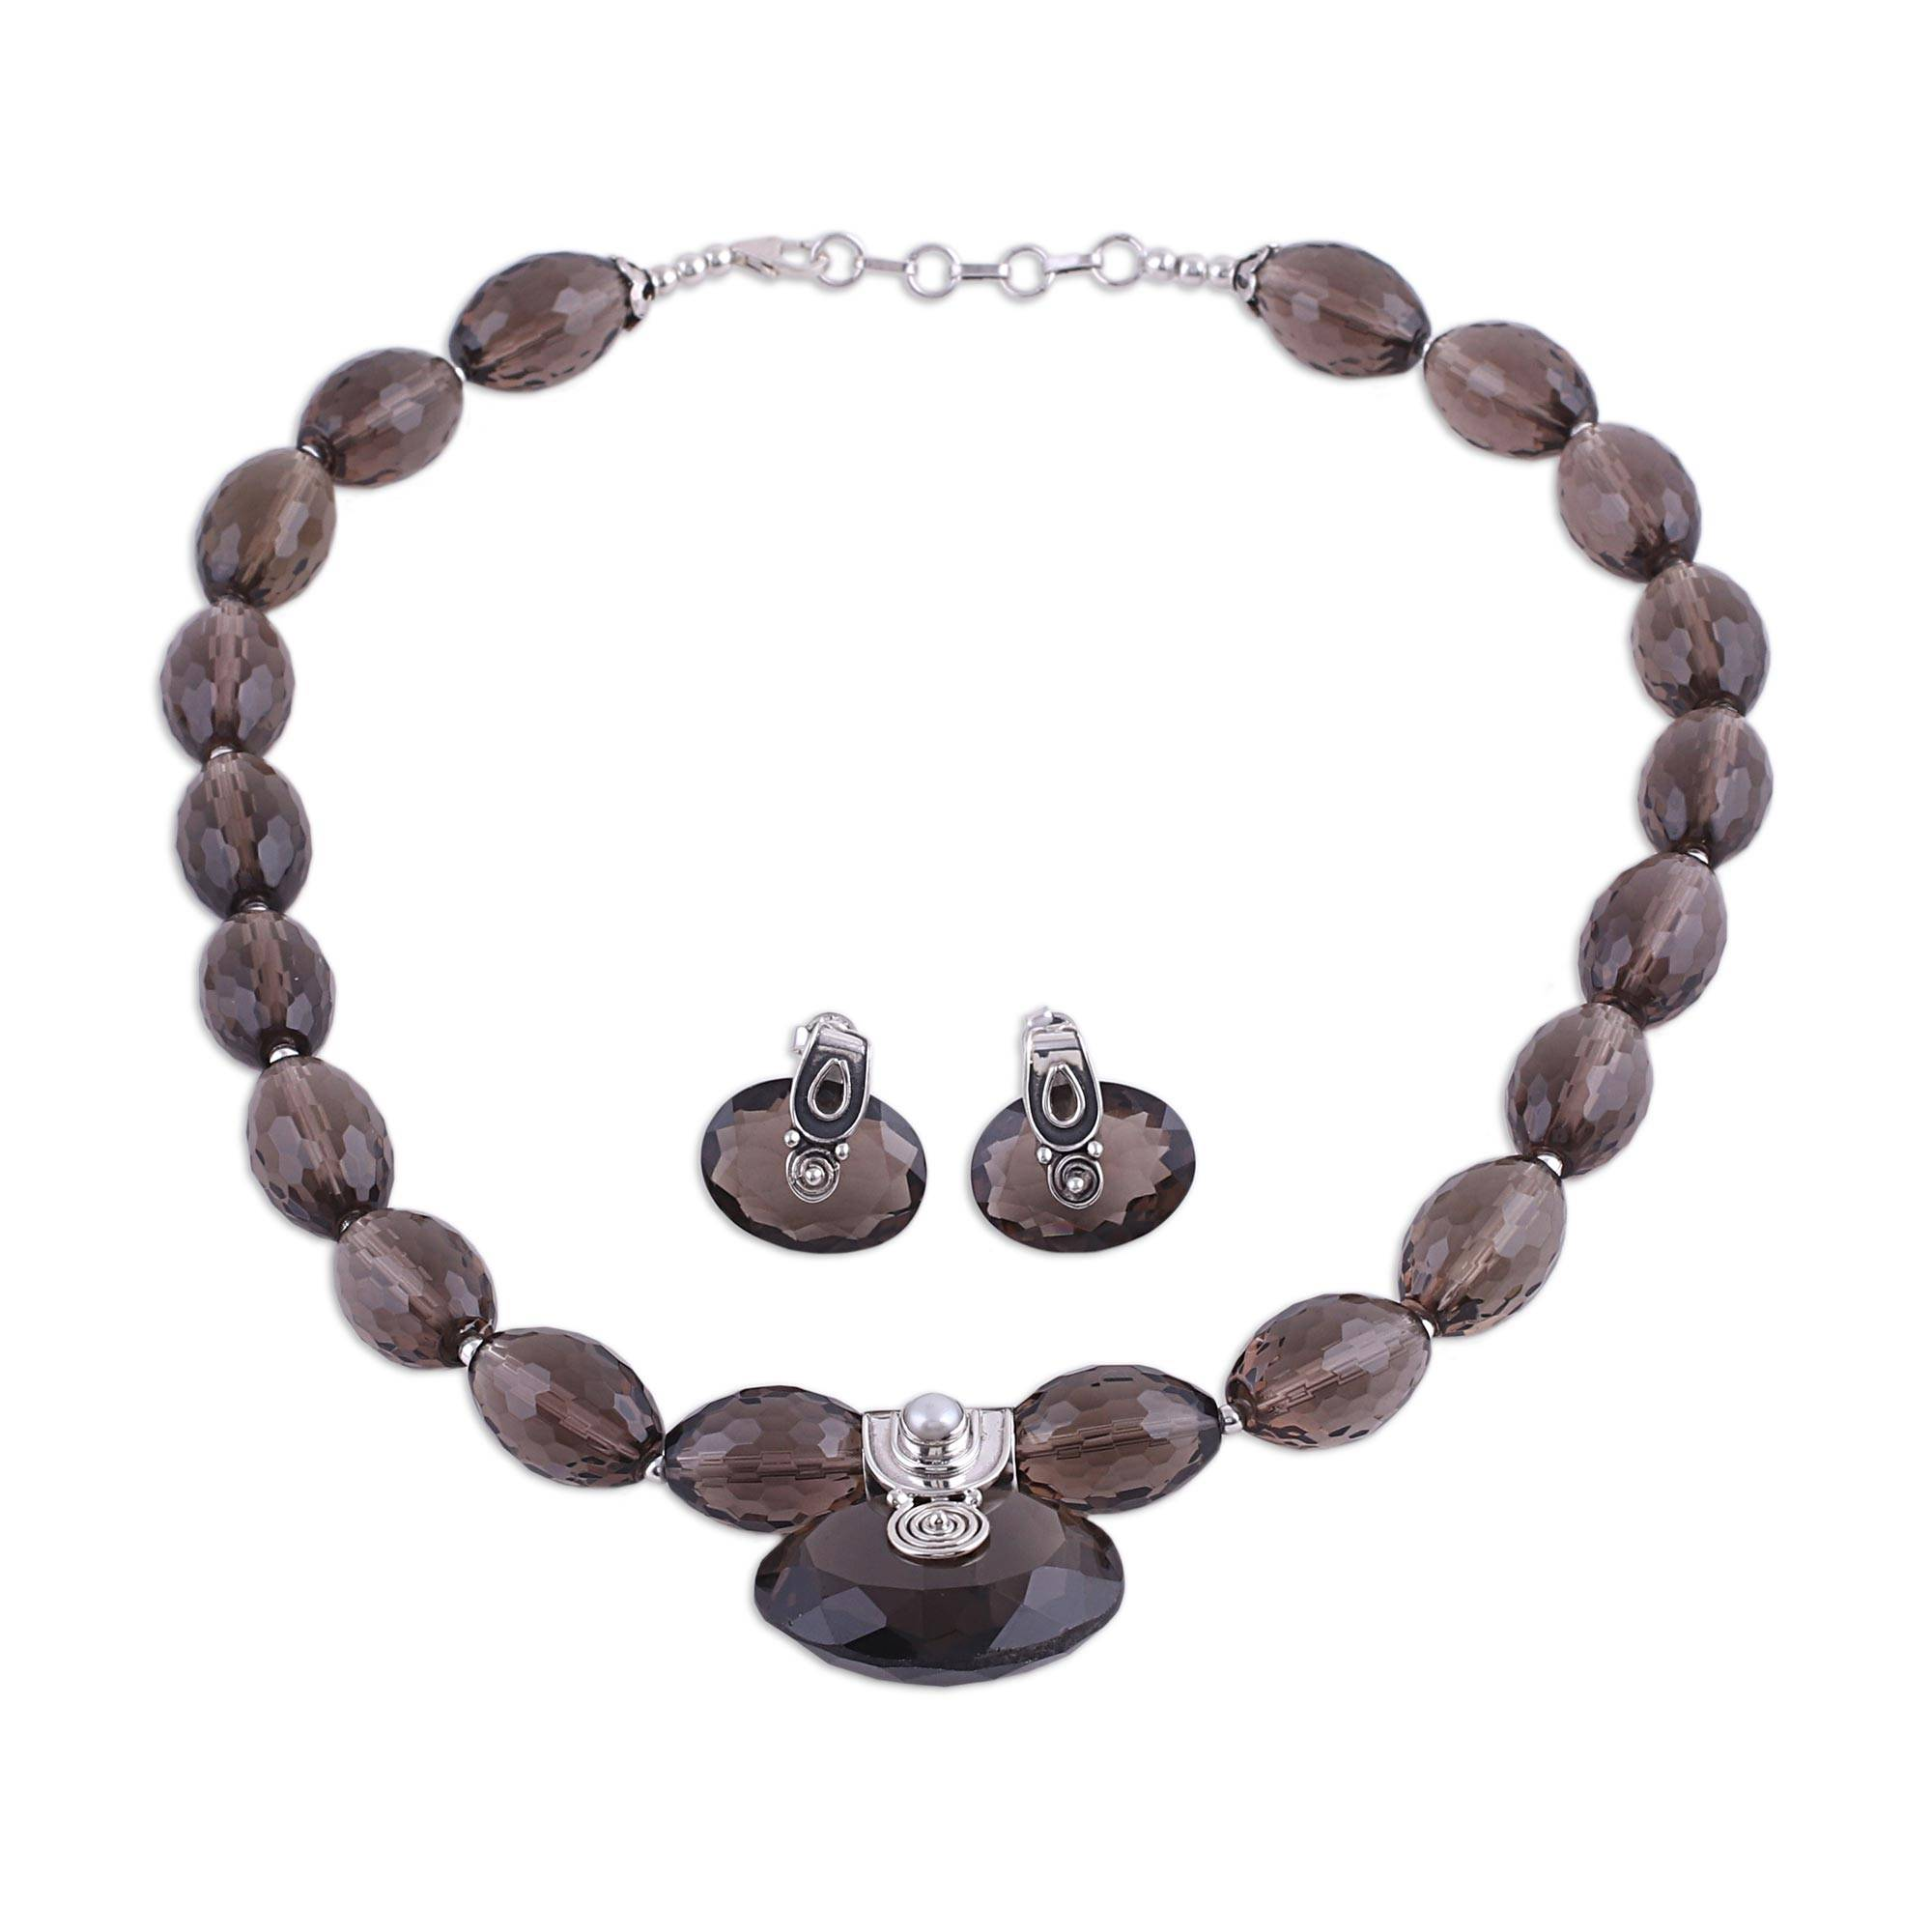 Unicef Uk Market Sterling Silver And Smoky Quartz Jewellery Set